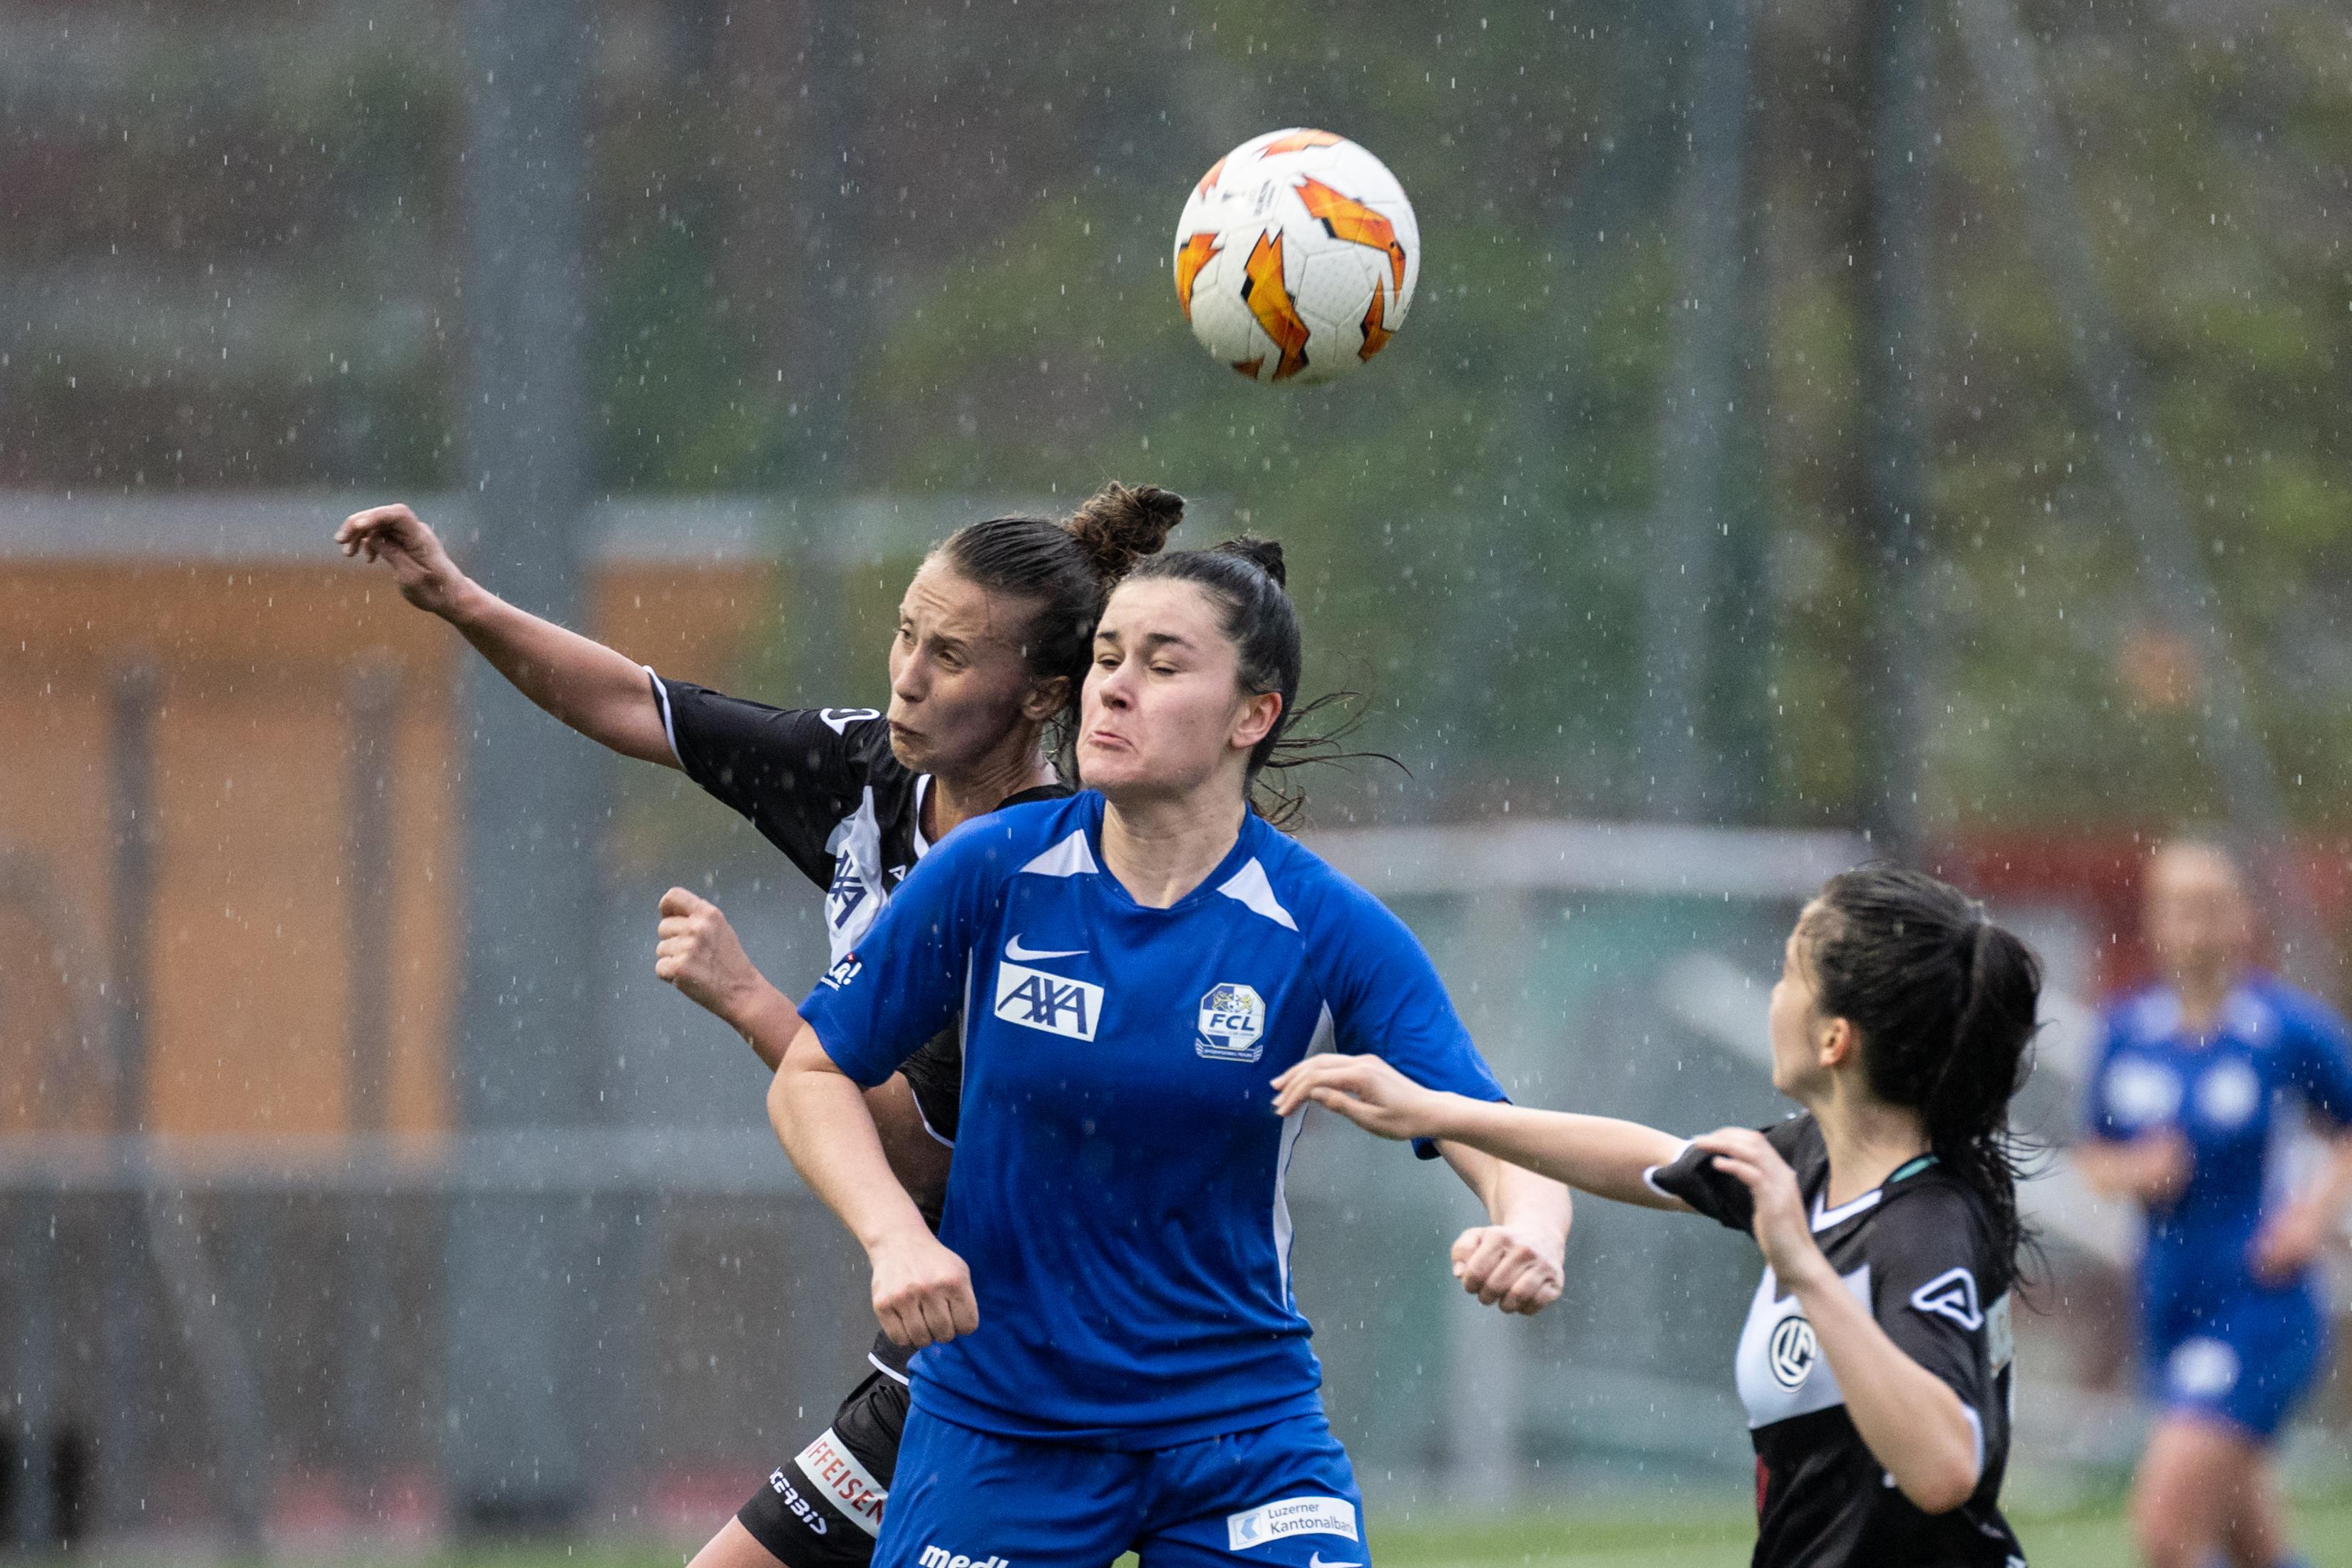 AWSL: FC Lugano - FCL 01.05.2021